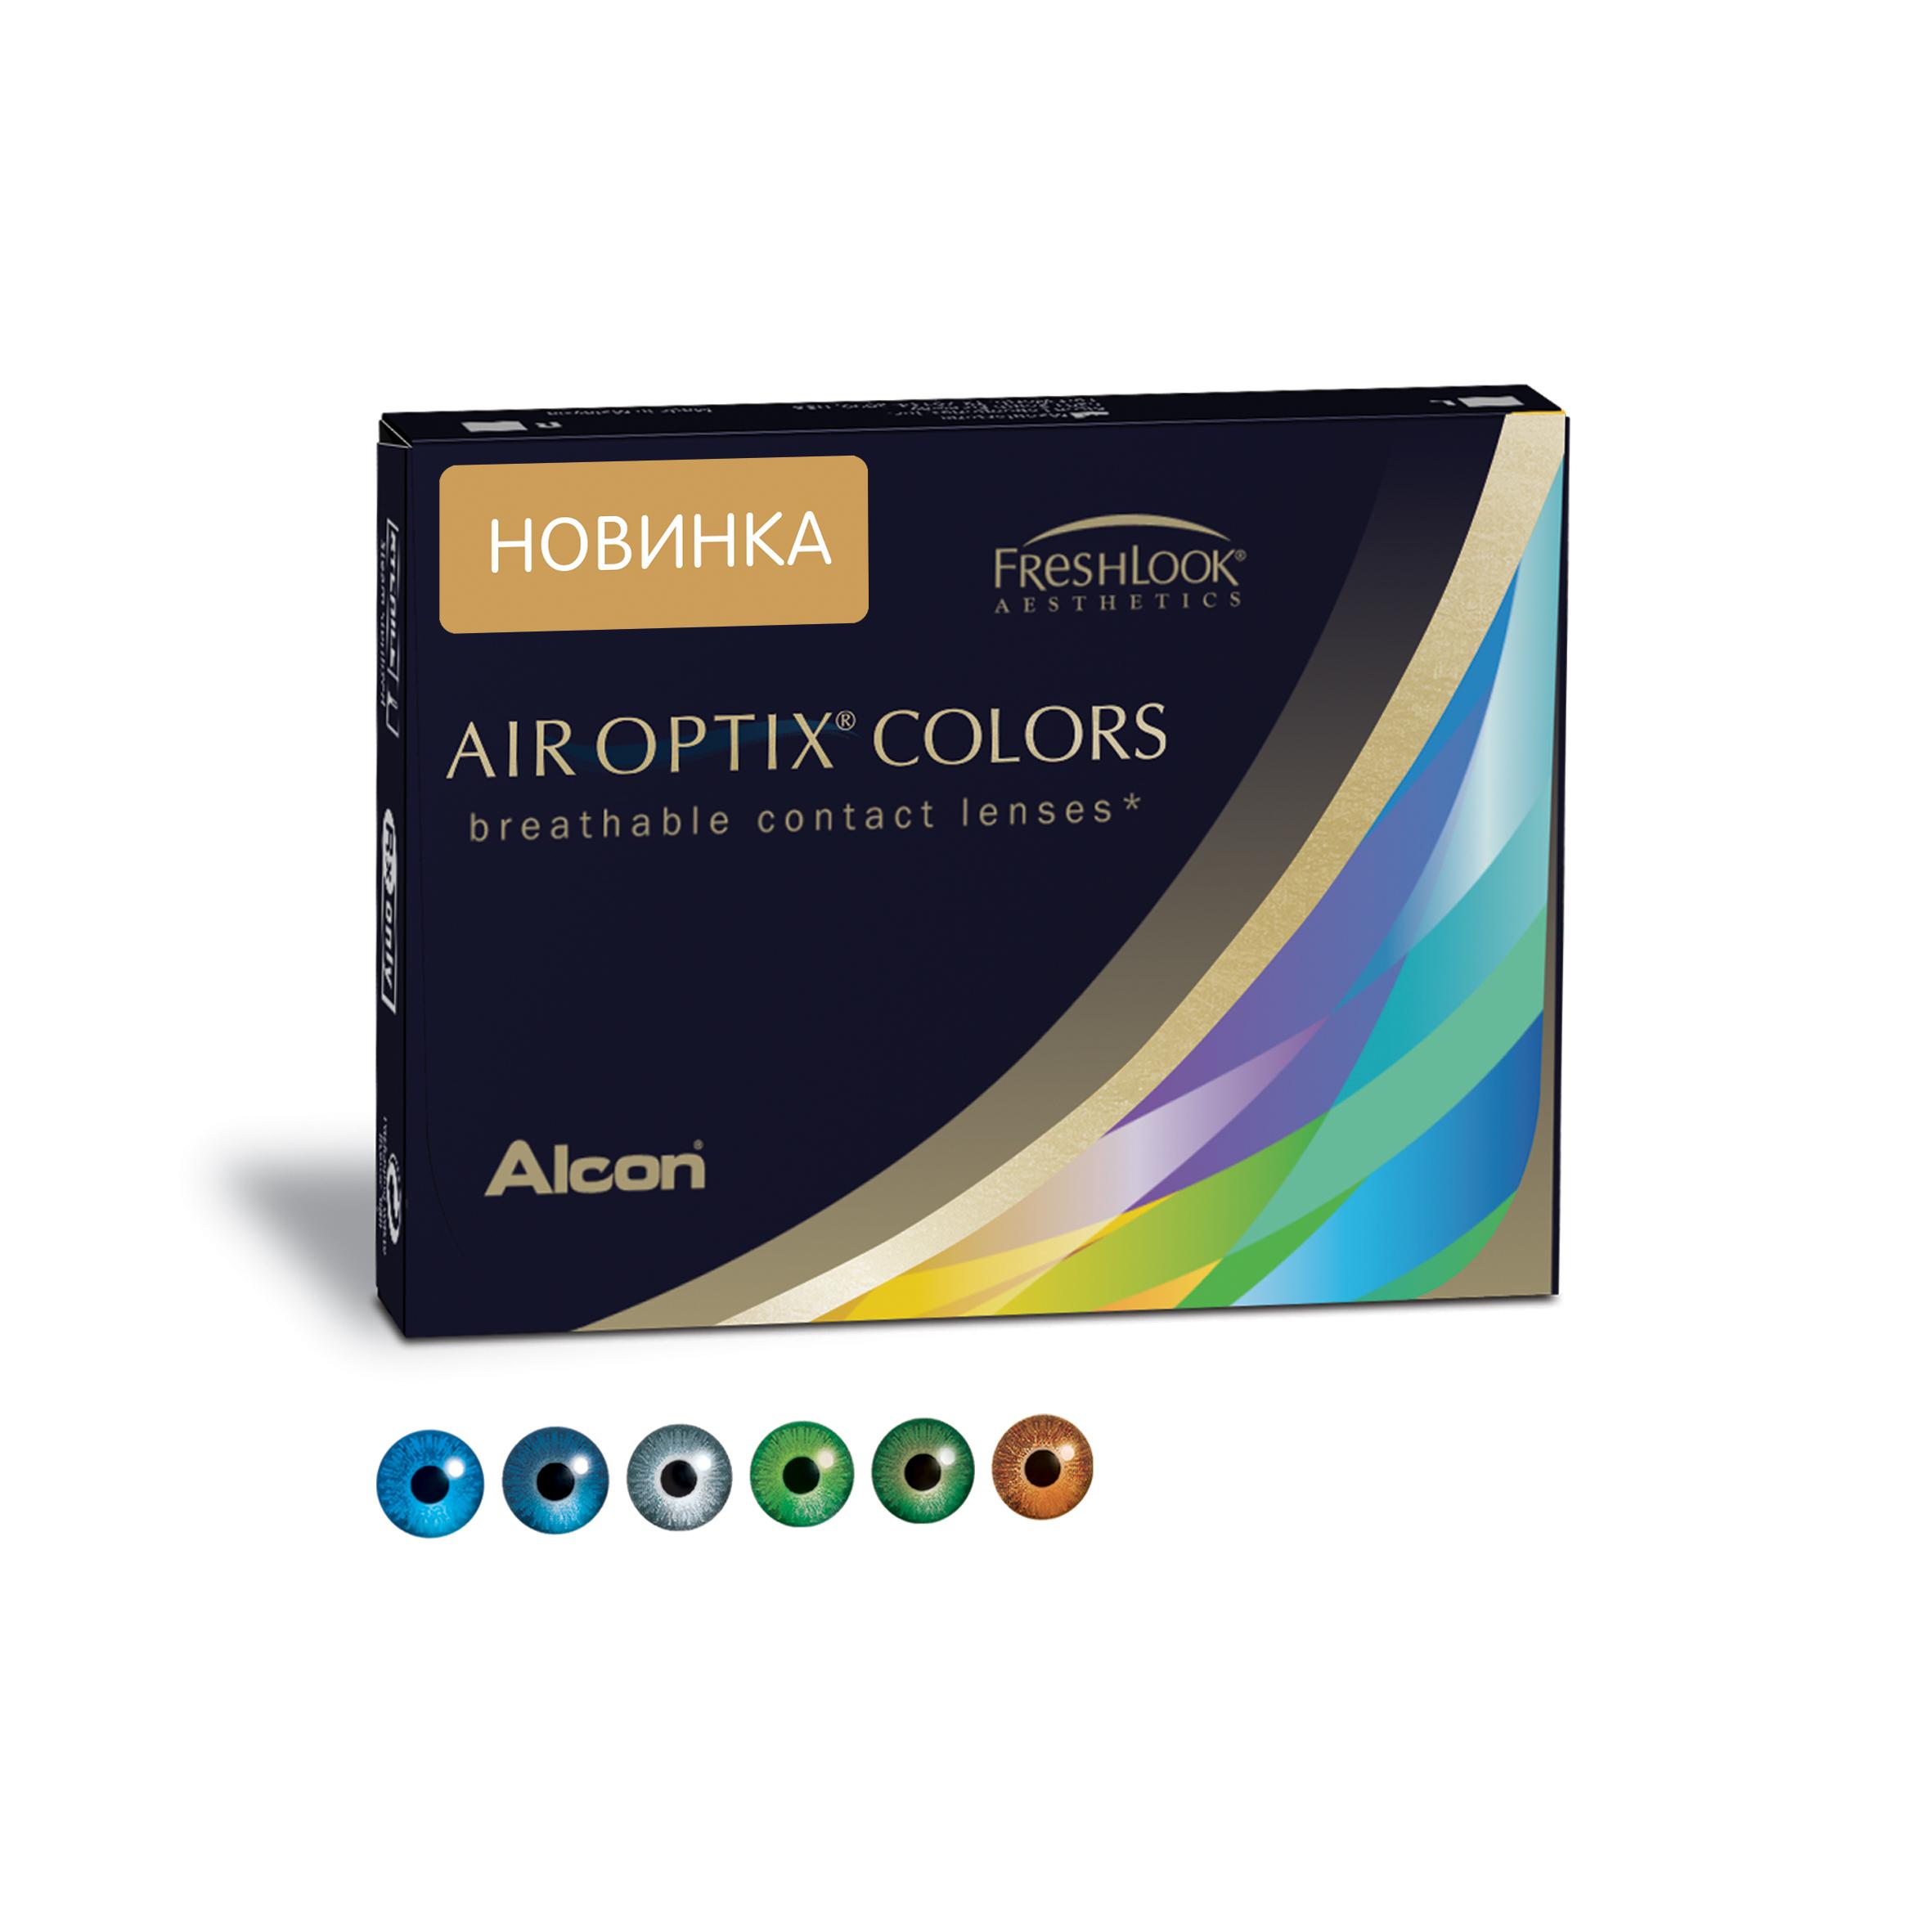 Аlcon контактные линзы Air Optix Colors 2 шт -4.25 Sterling Gray31746246Мягкие контактные линзы